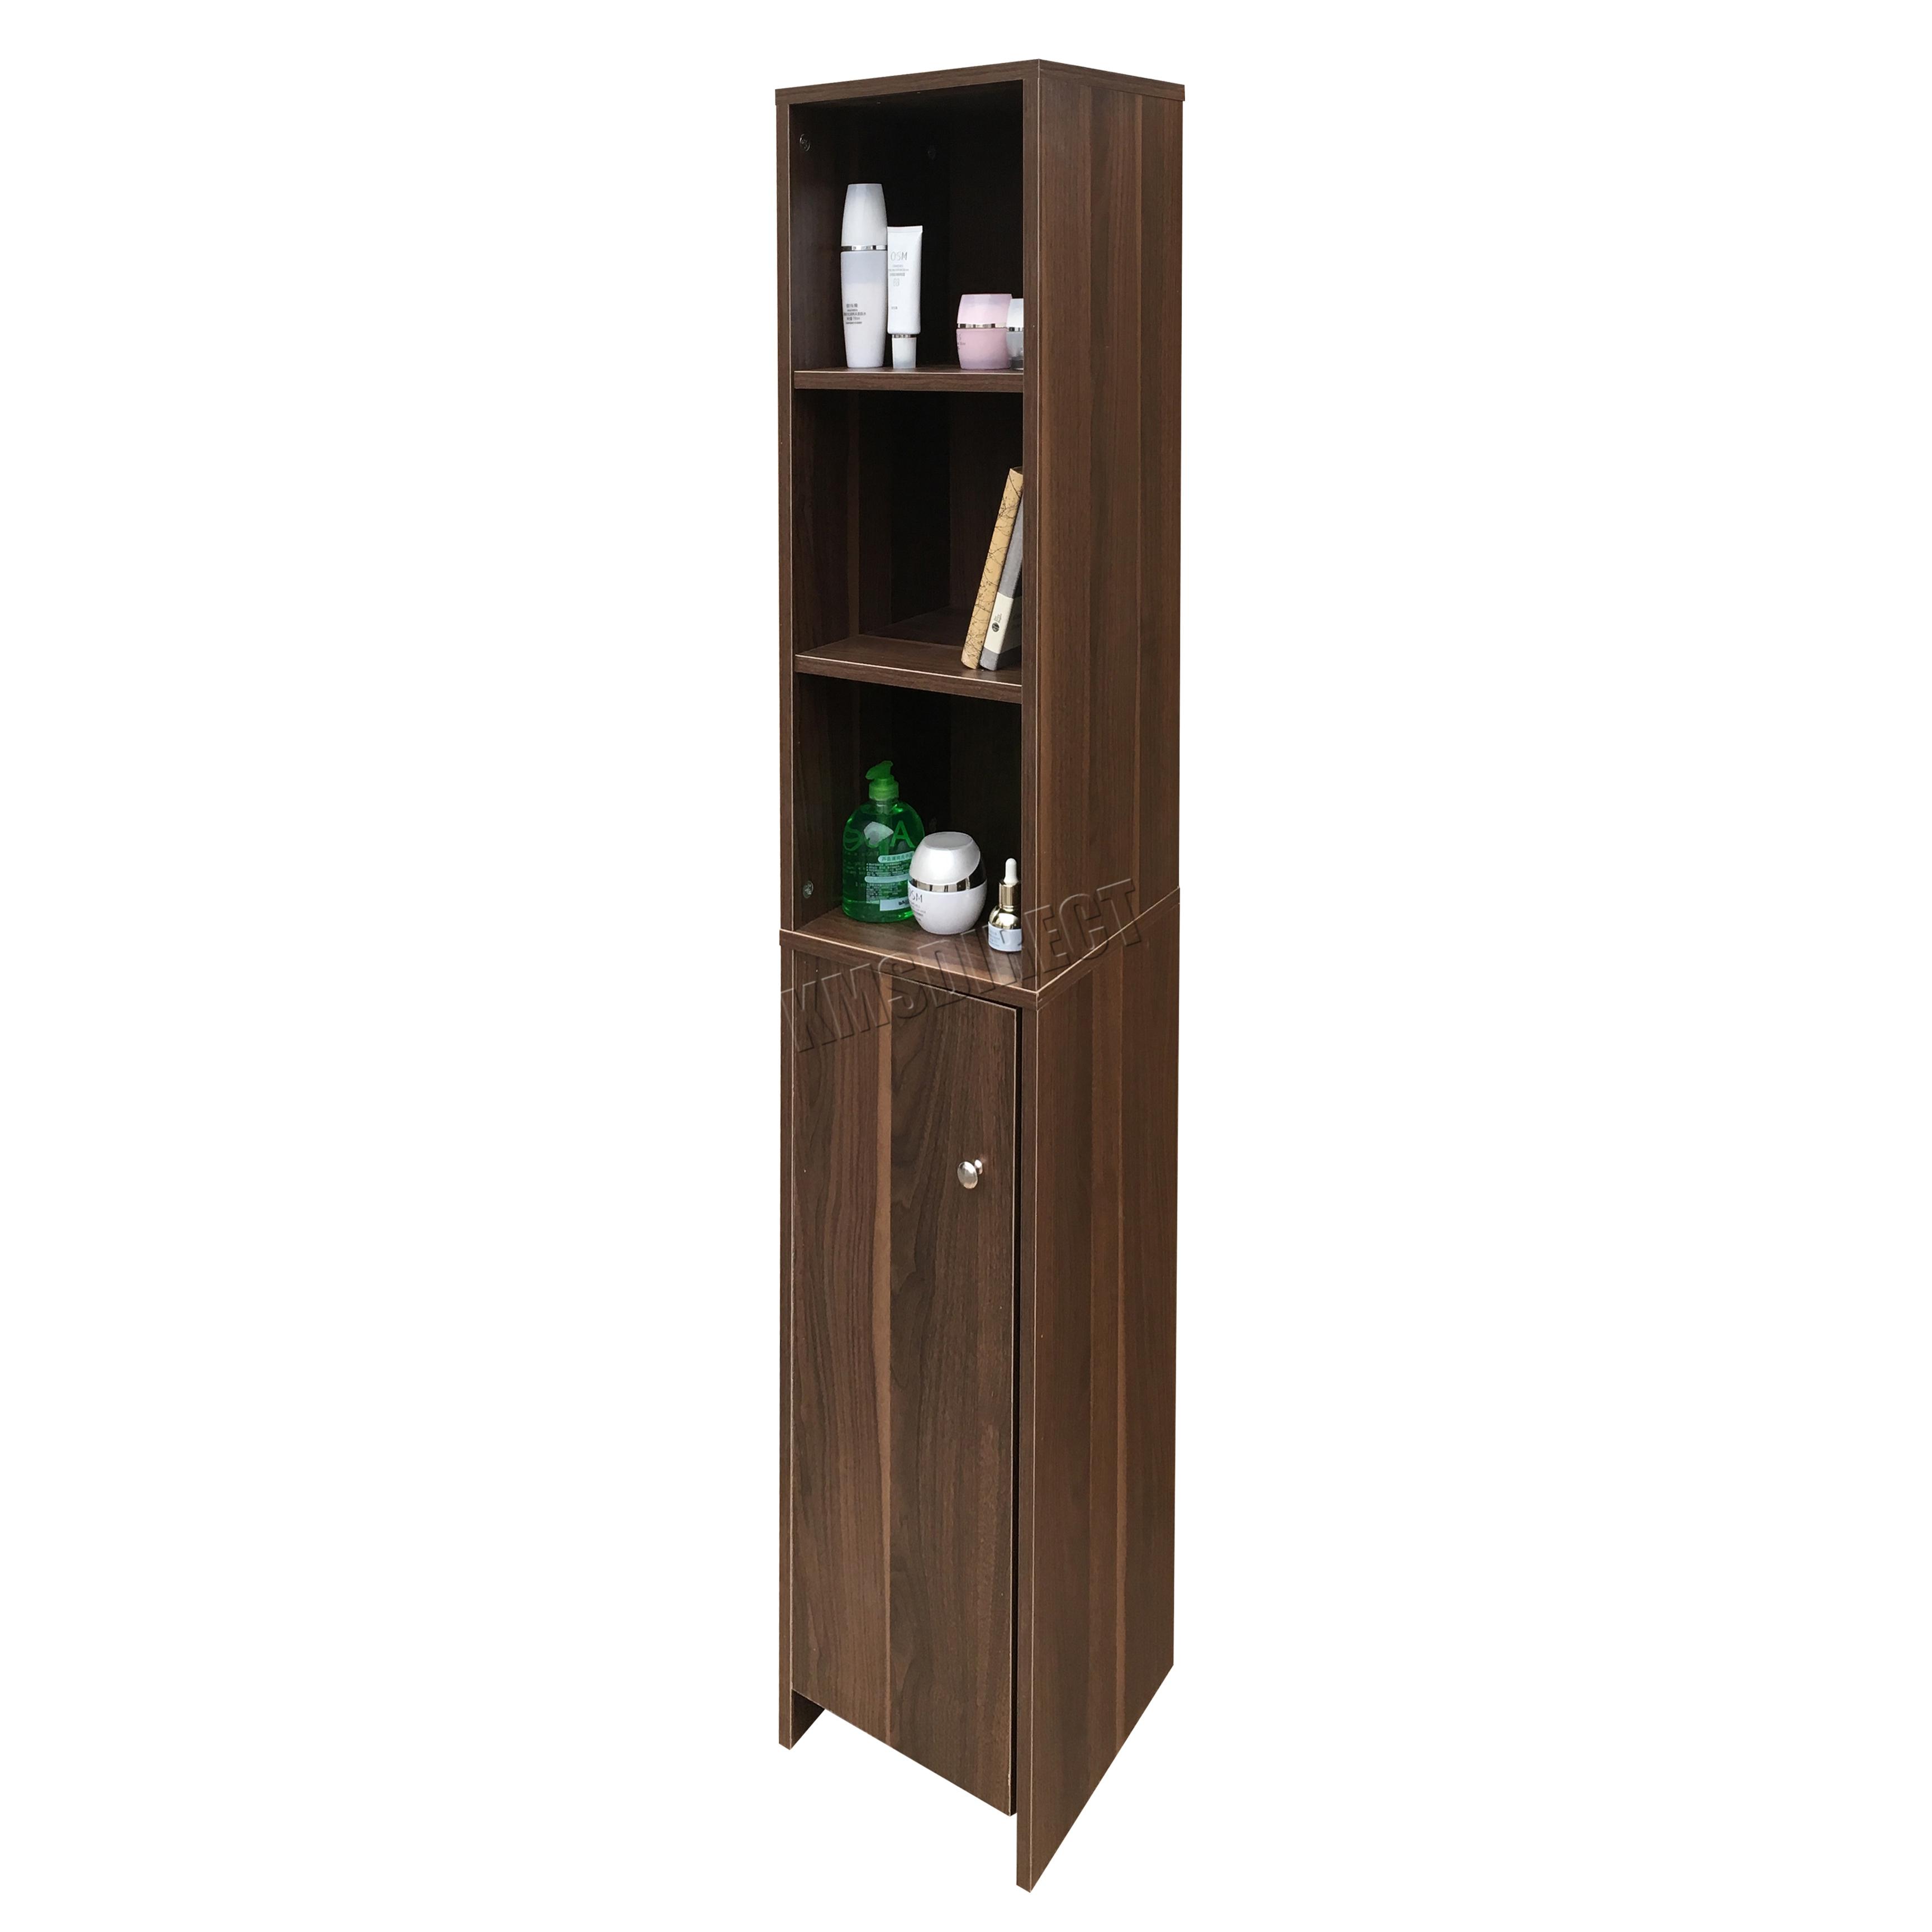 Foxhunter wall mount wooden bathroom cabinet tall shelving storage tallboy bc08 ebay for Tall wooden bathroom cabinets